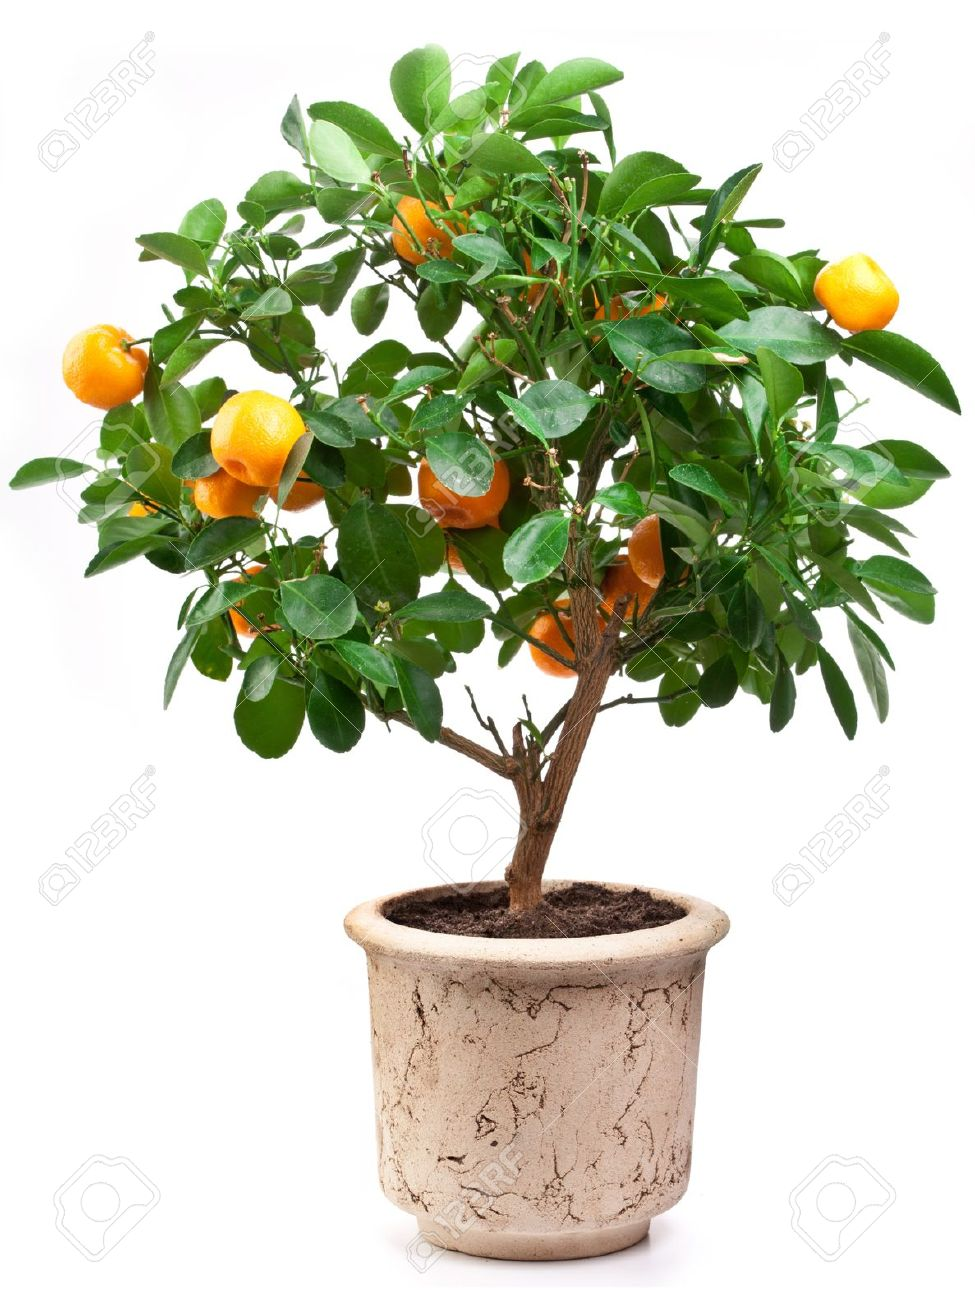 Small tangerines tree on white background. Stock Photo - 9737692